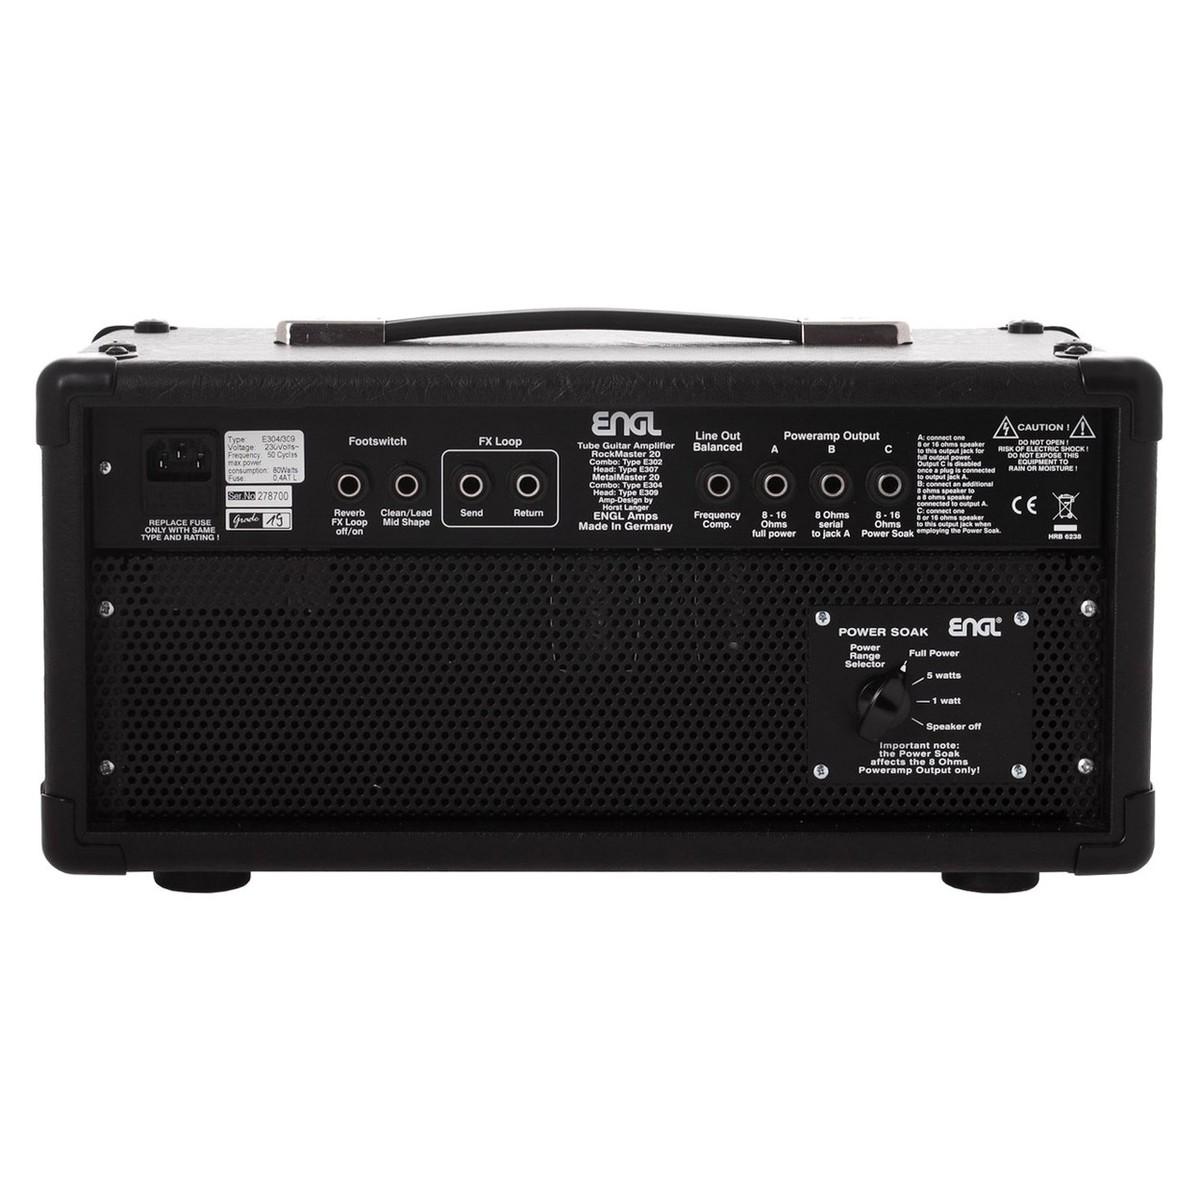 engl metalmaster e309 guitar amplifier head at gear4music com rh gear4music com Guitar Input Jack Wiring Mono Guitar Output Jack Wiring Active